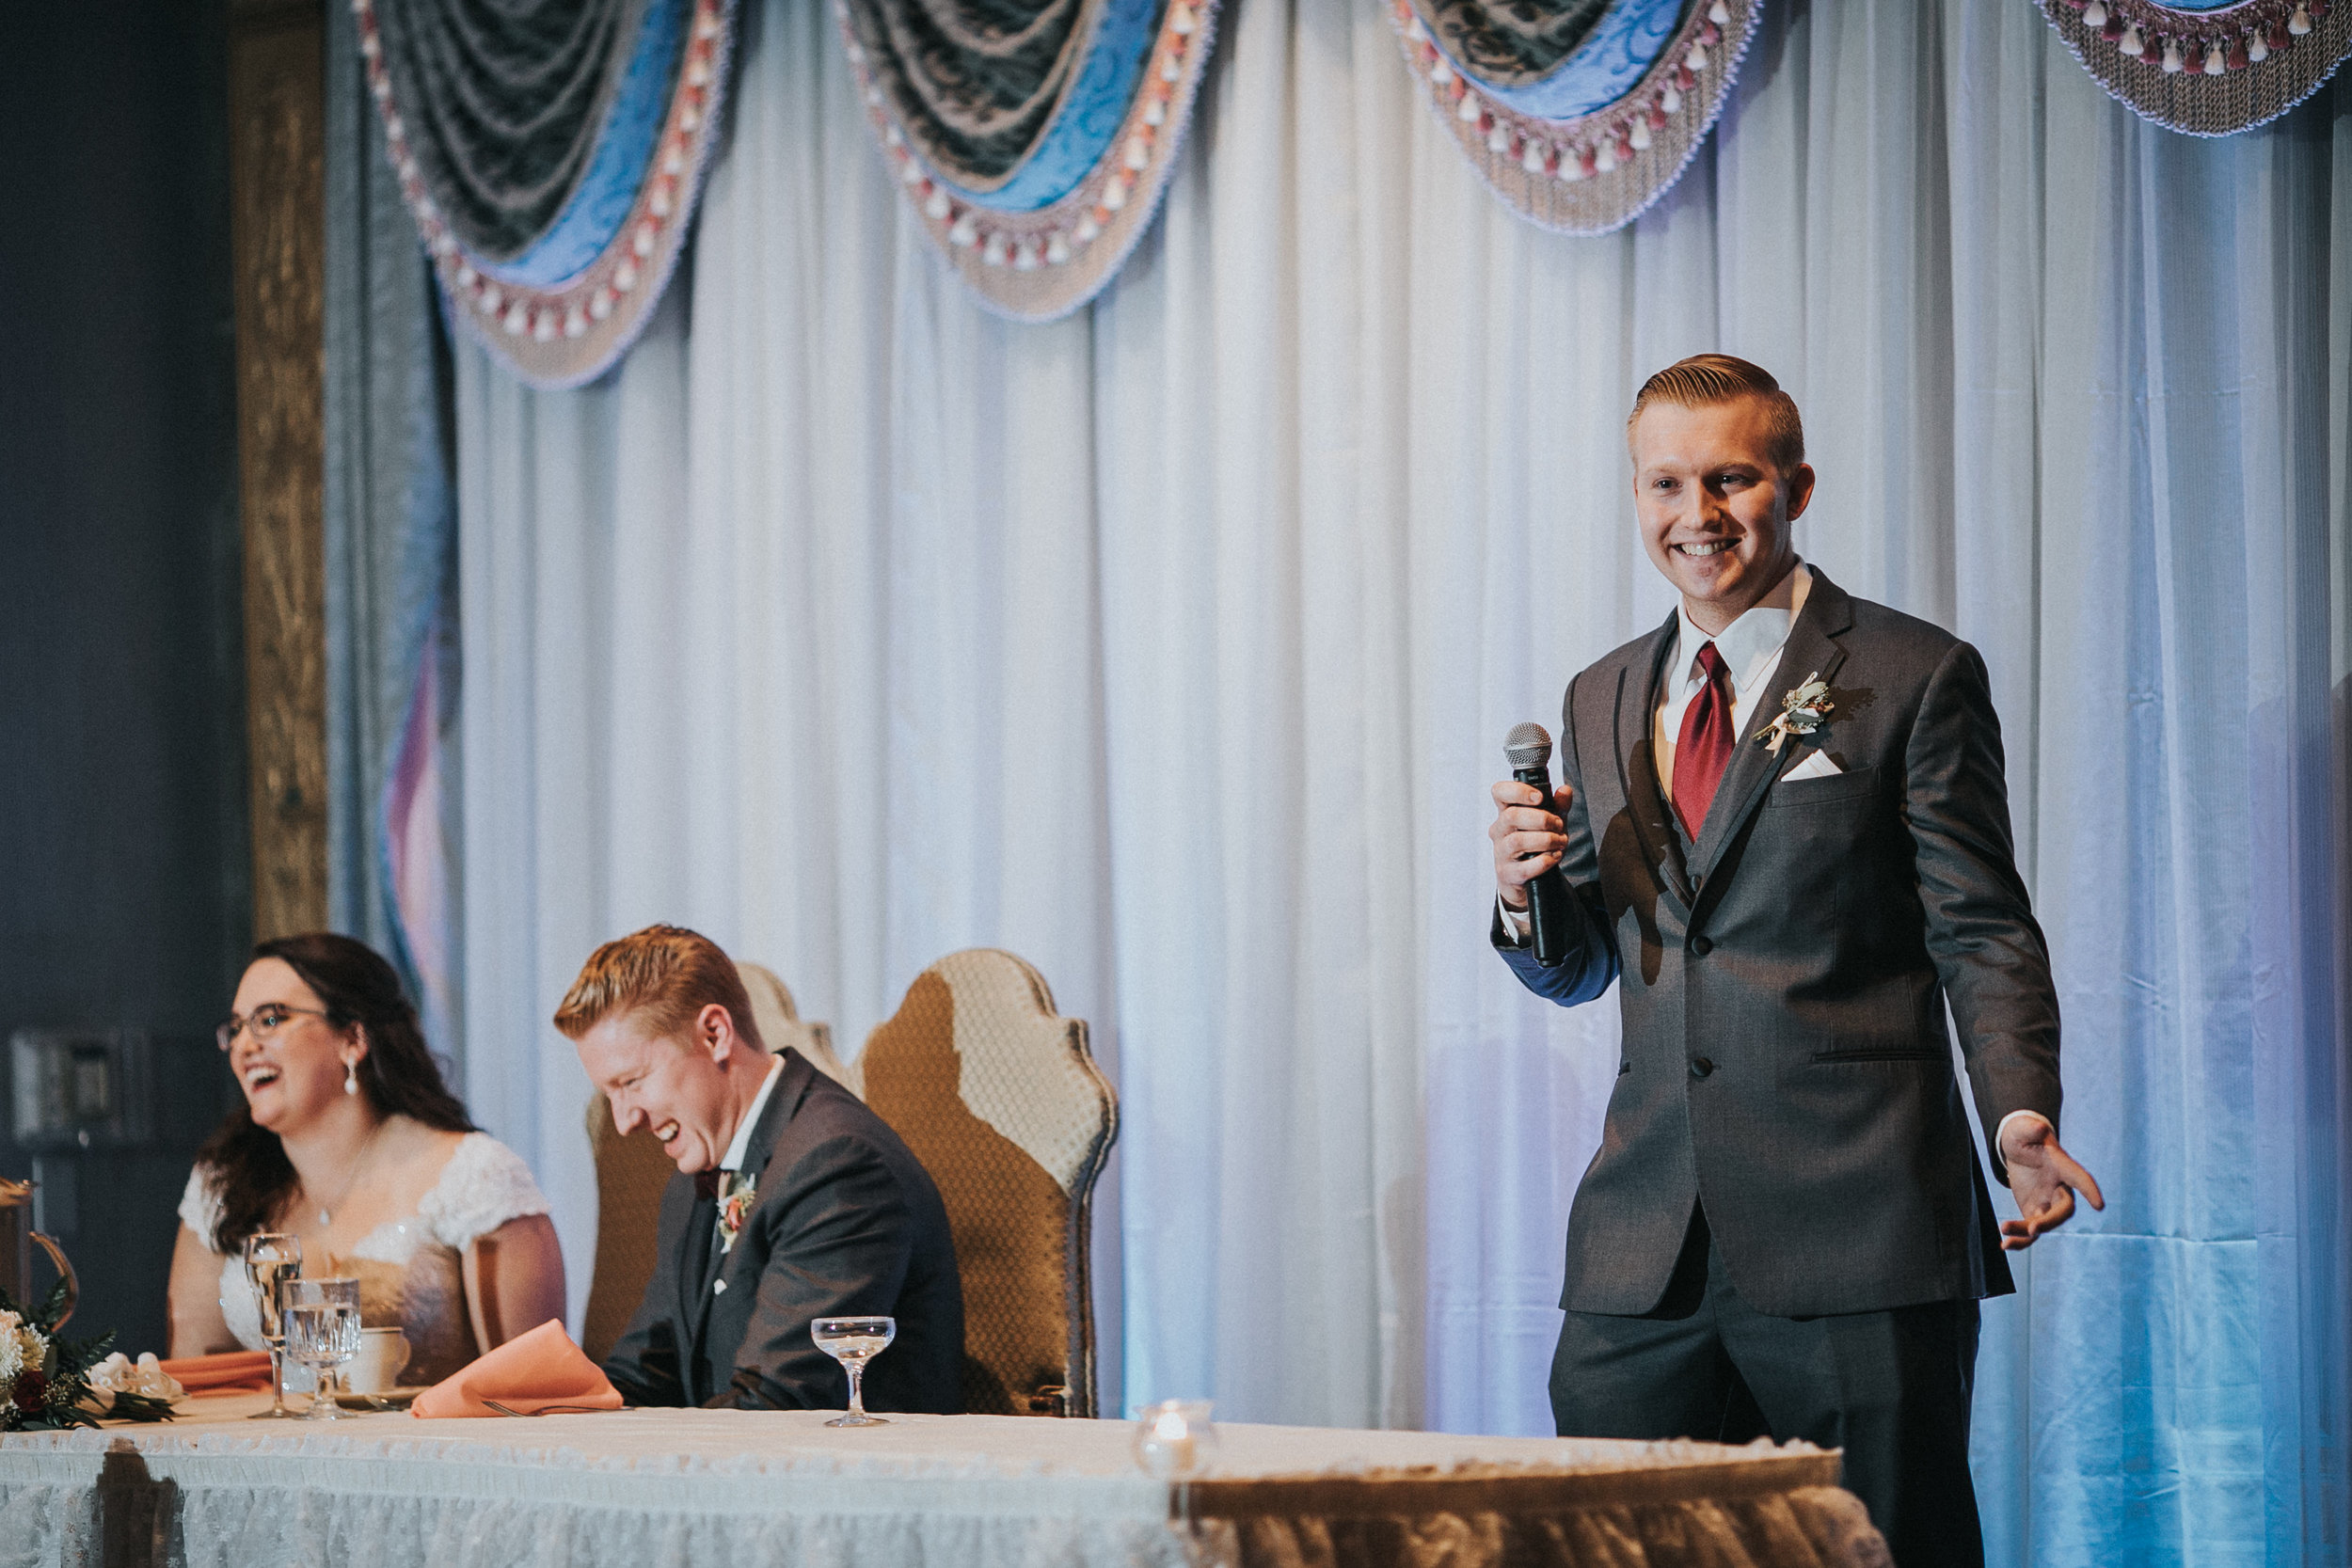 New-Jersey-Wedding-Photography-Fishers-Tudor-House-JennaLynnPhotography-Reception-Kathleen&Eddie-148.jpg